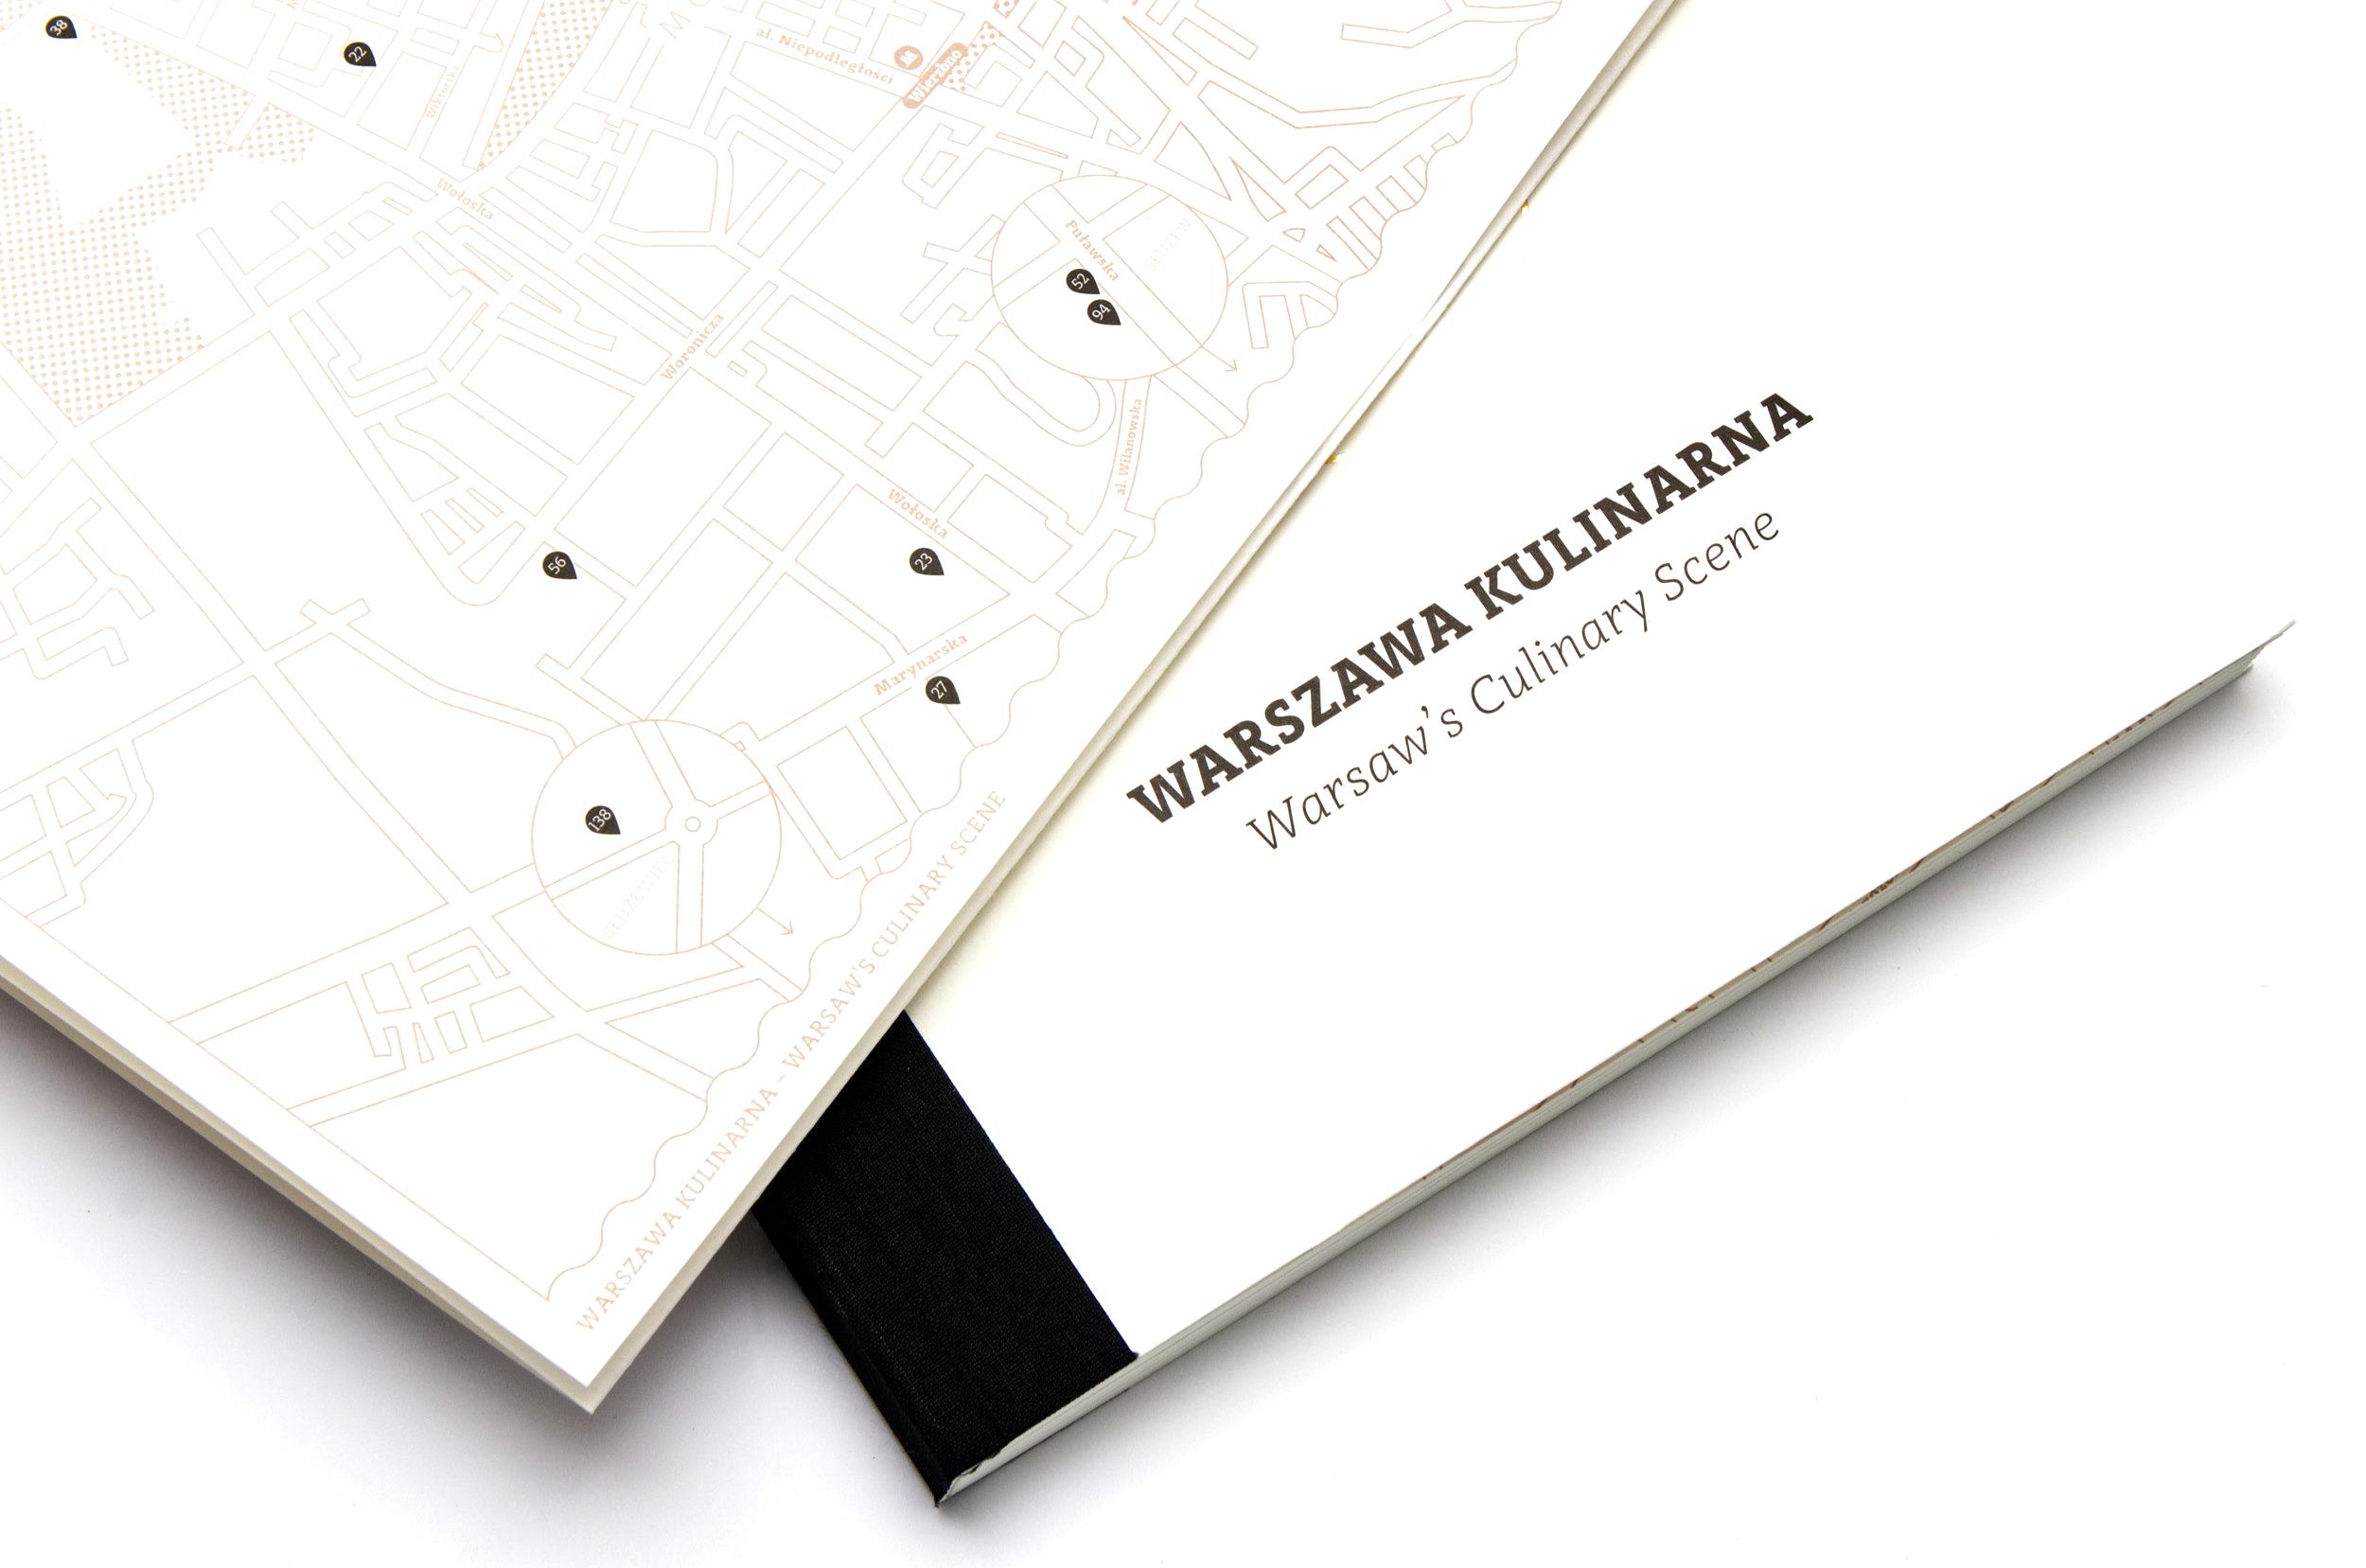 Warszawa Kulinarna 2018